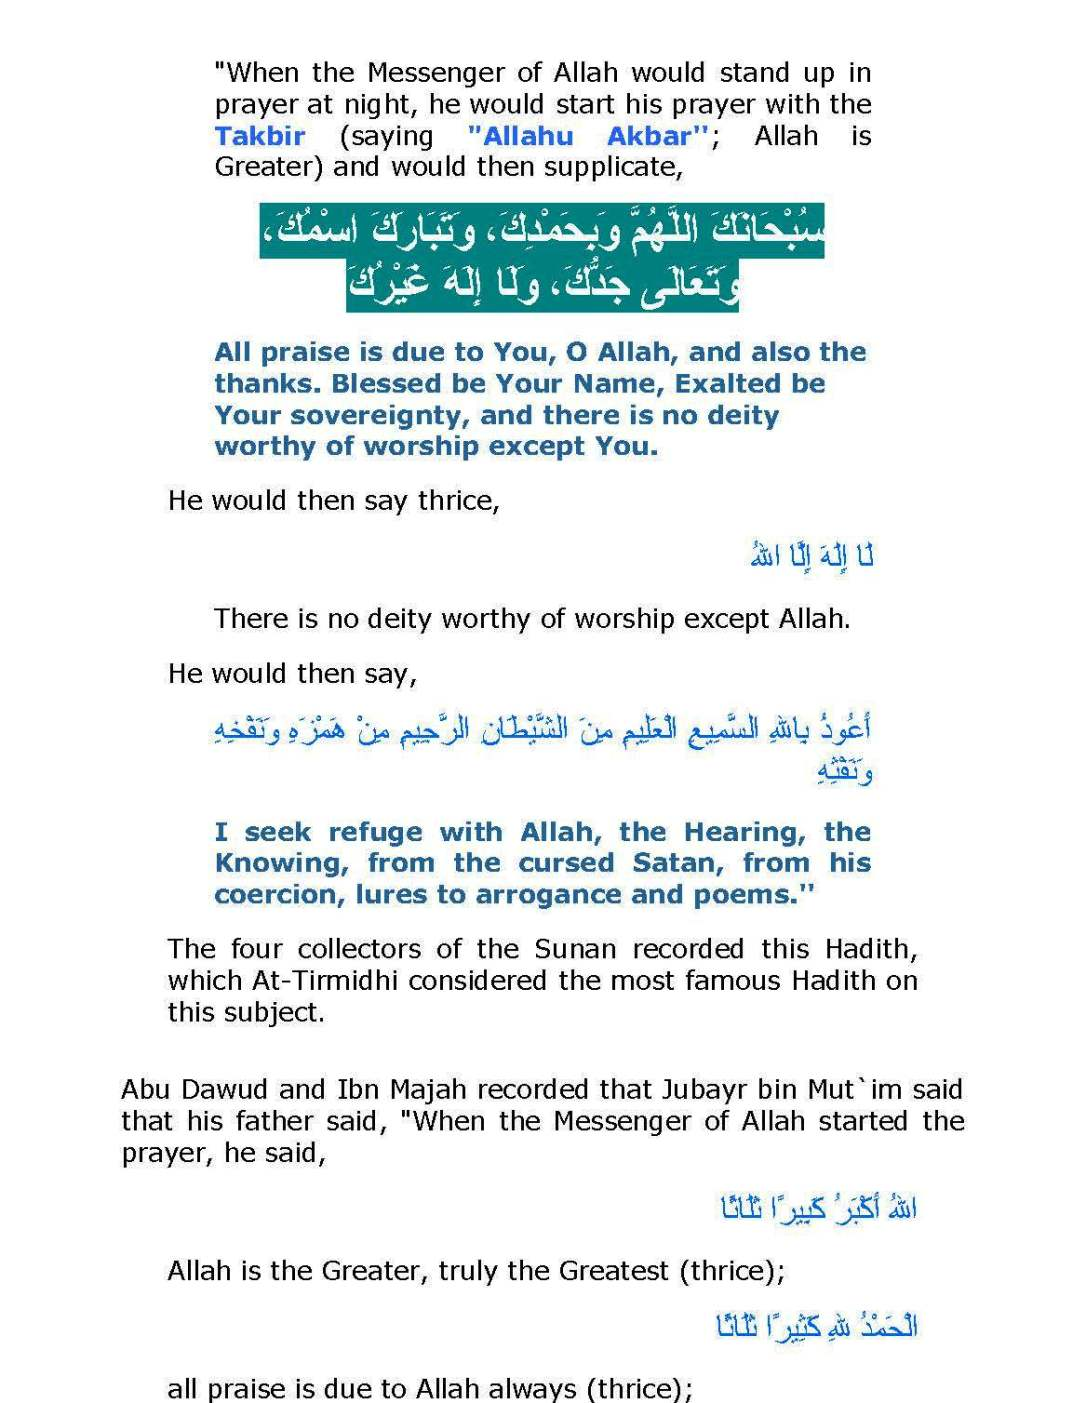 001Fateh_Page_16